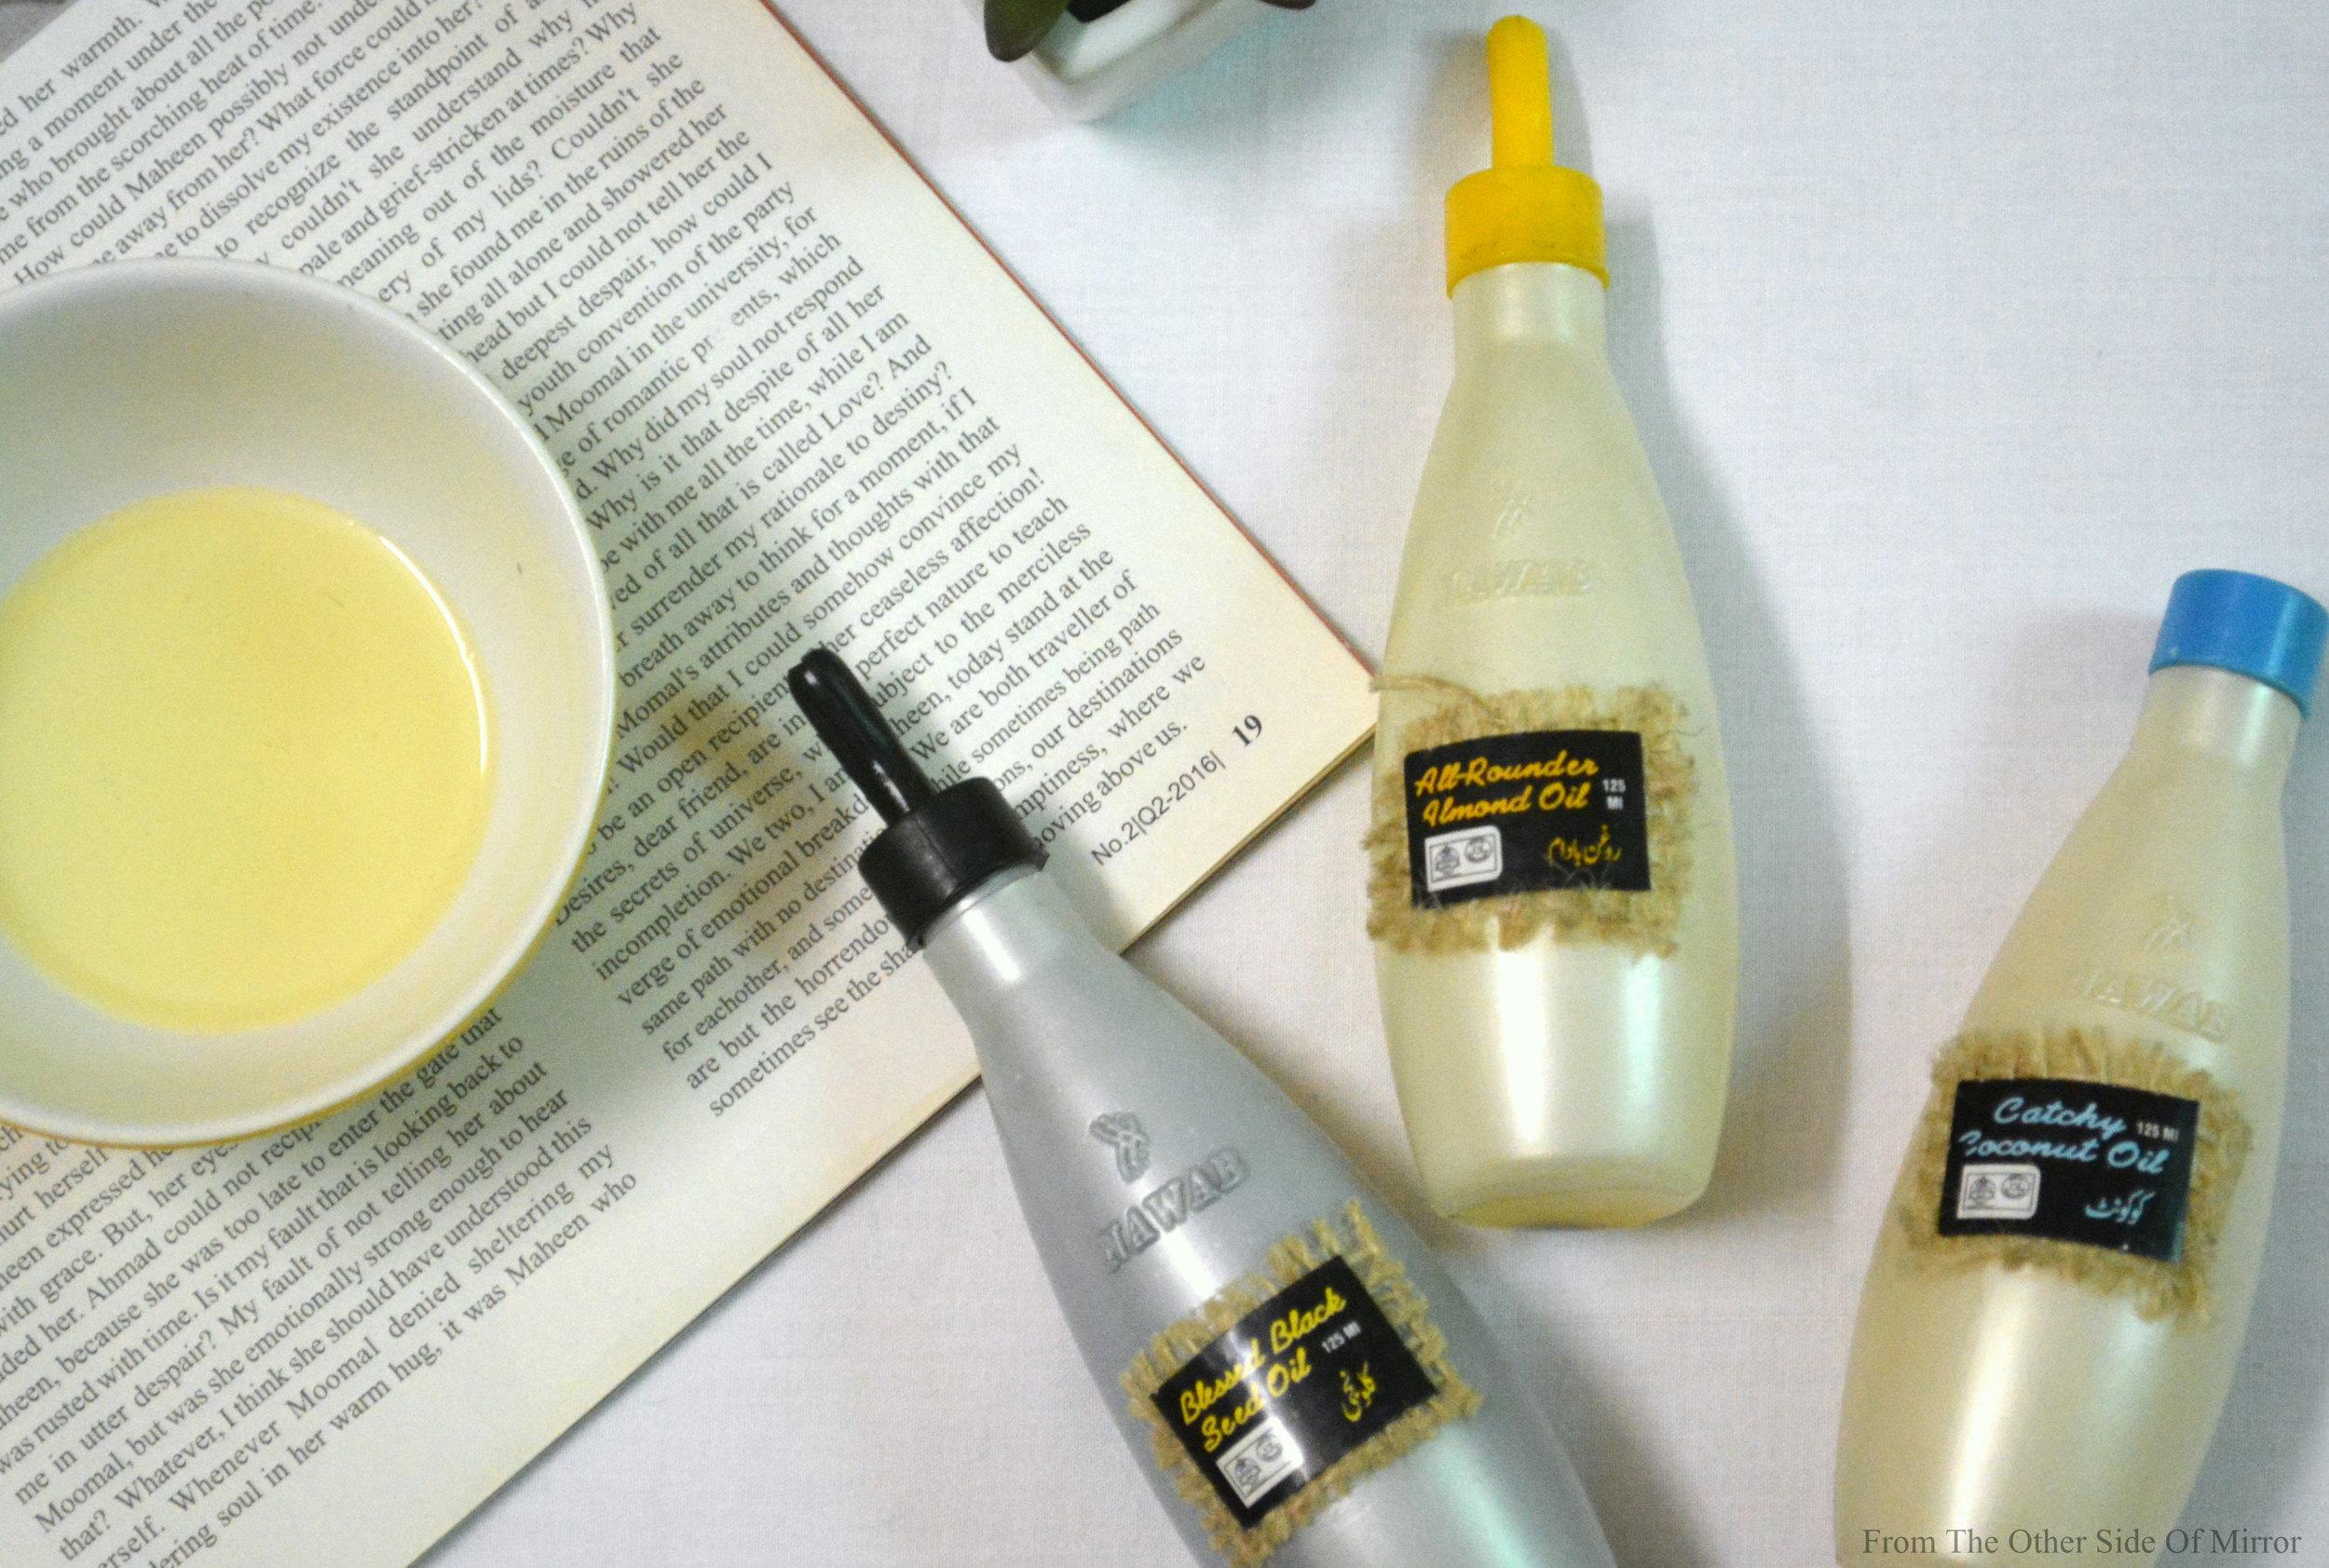 100% Organic Natural Oils by Nawab Organics